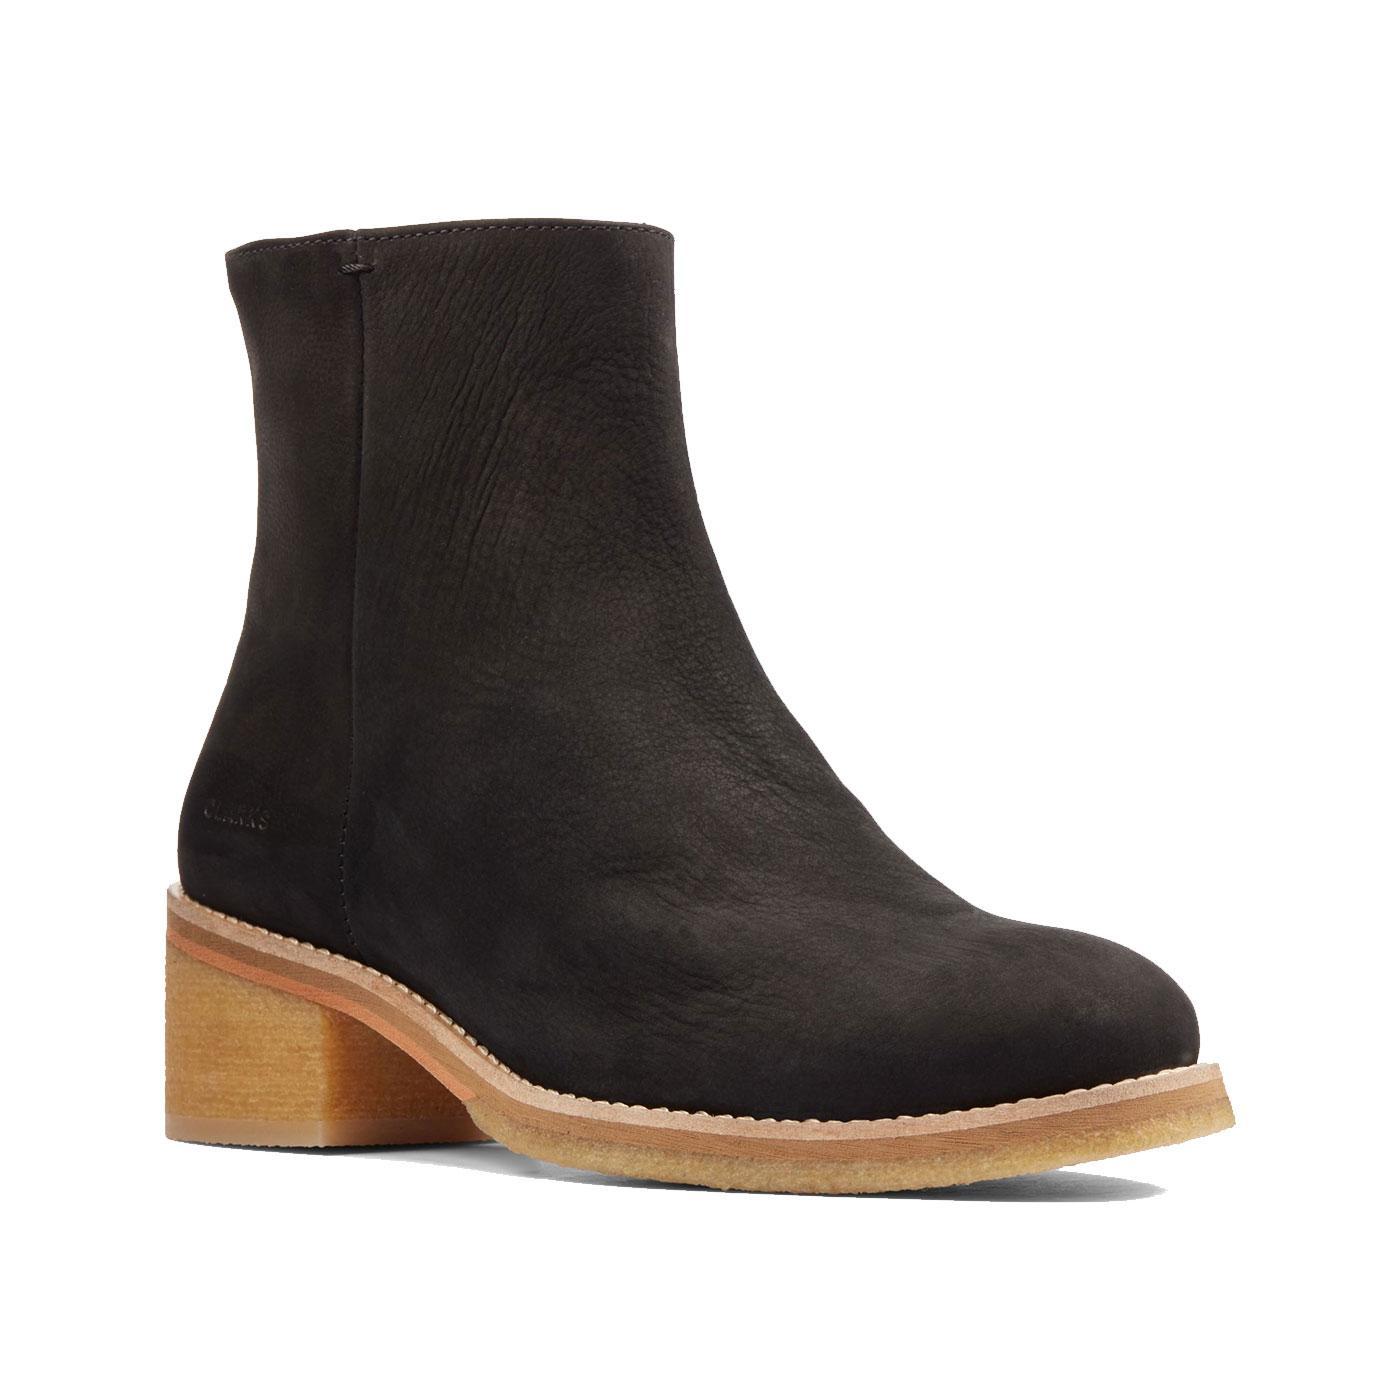 Amara CLARKS ORIGINALS Womens Crepe Heel Boots B